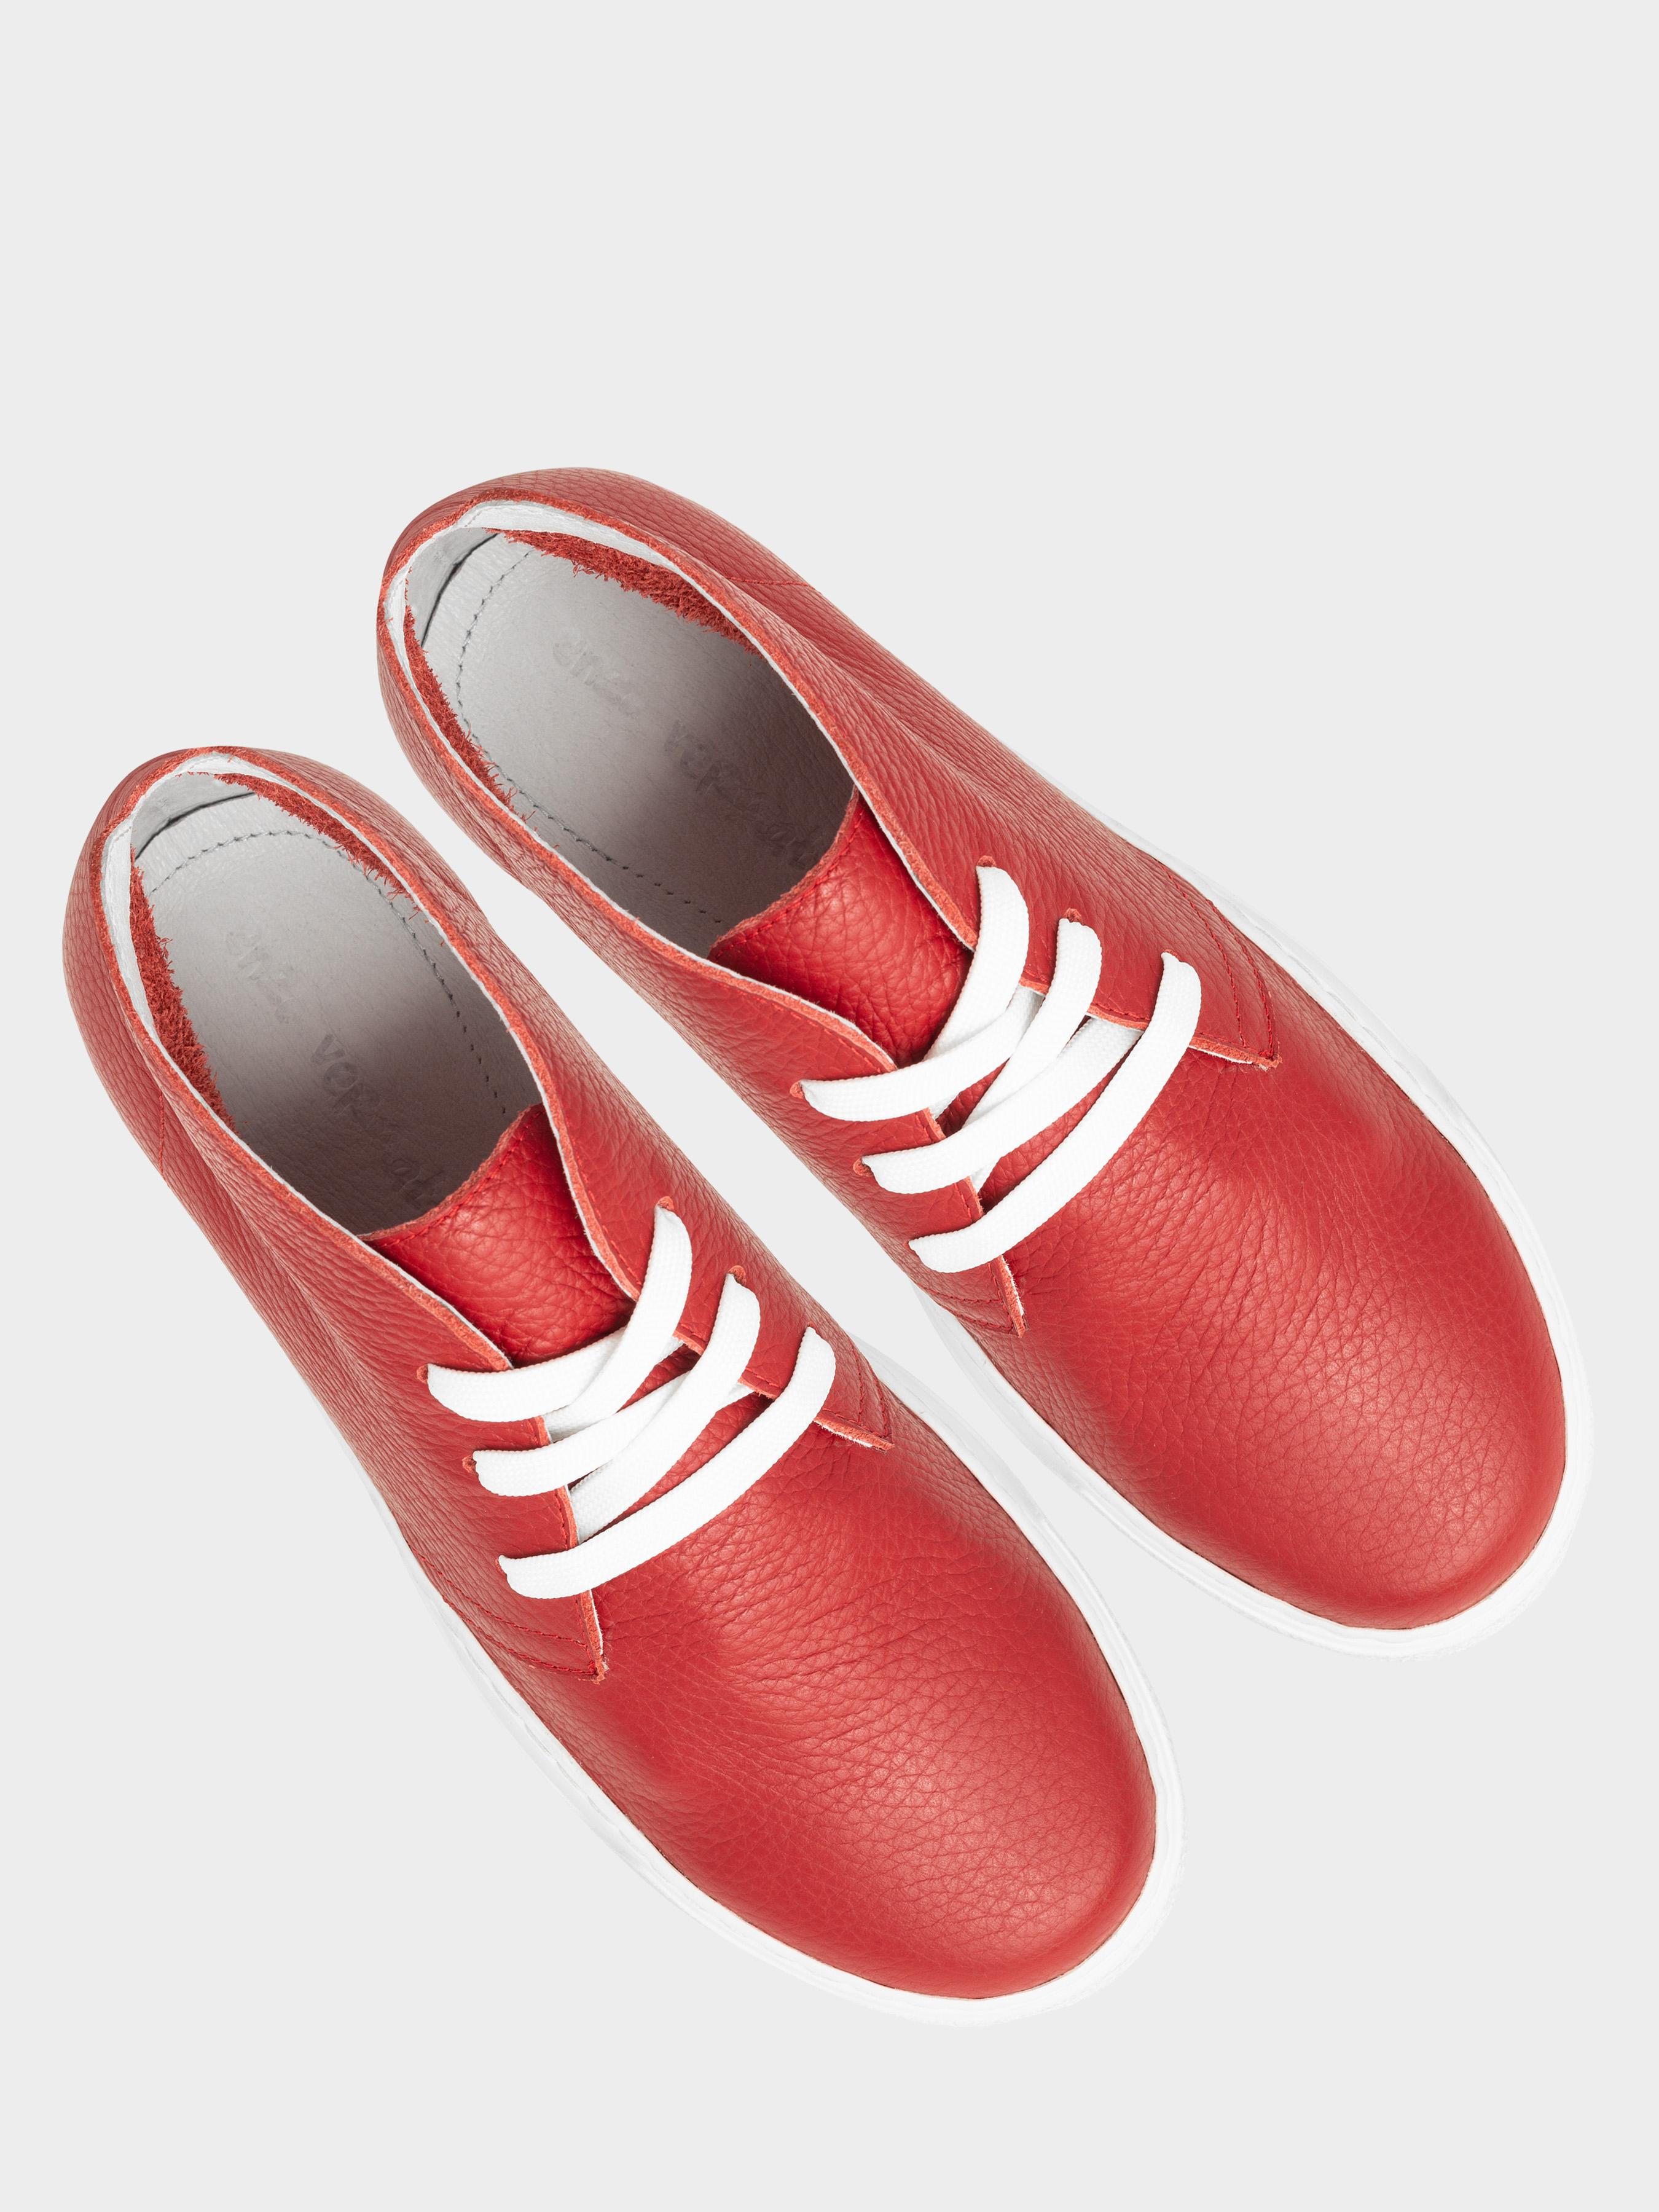 Ботинки для женщин Ботинки женские ENZO VERRATTI 18-1426-1r примерка, 2017